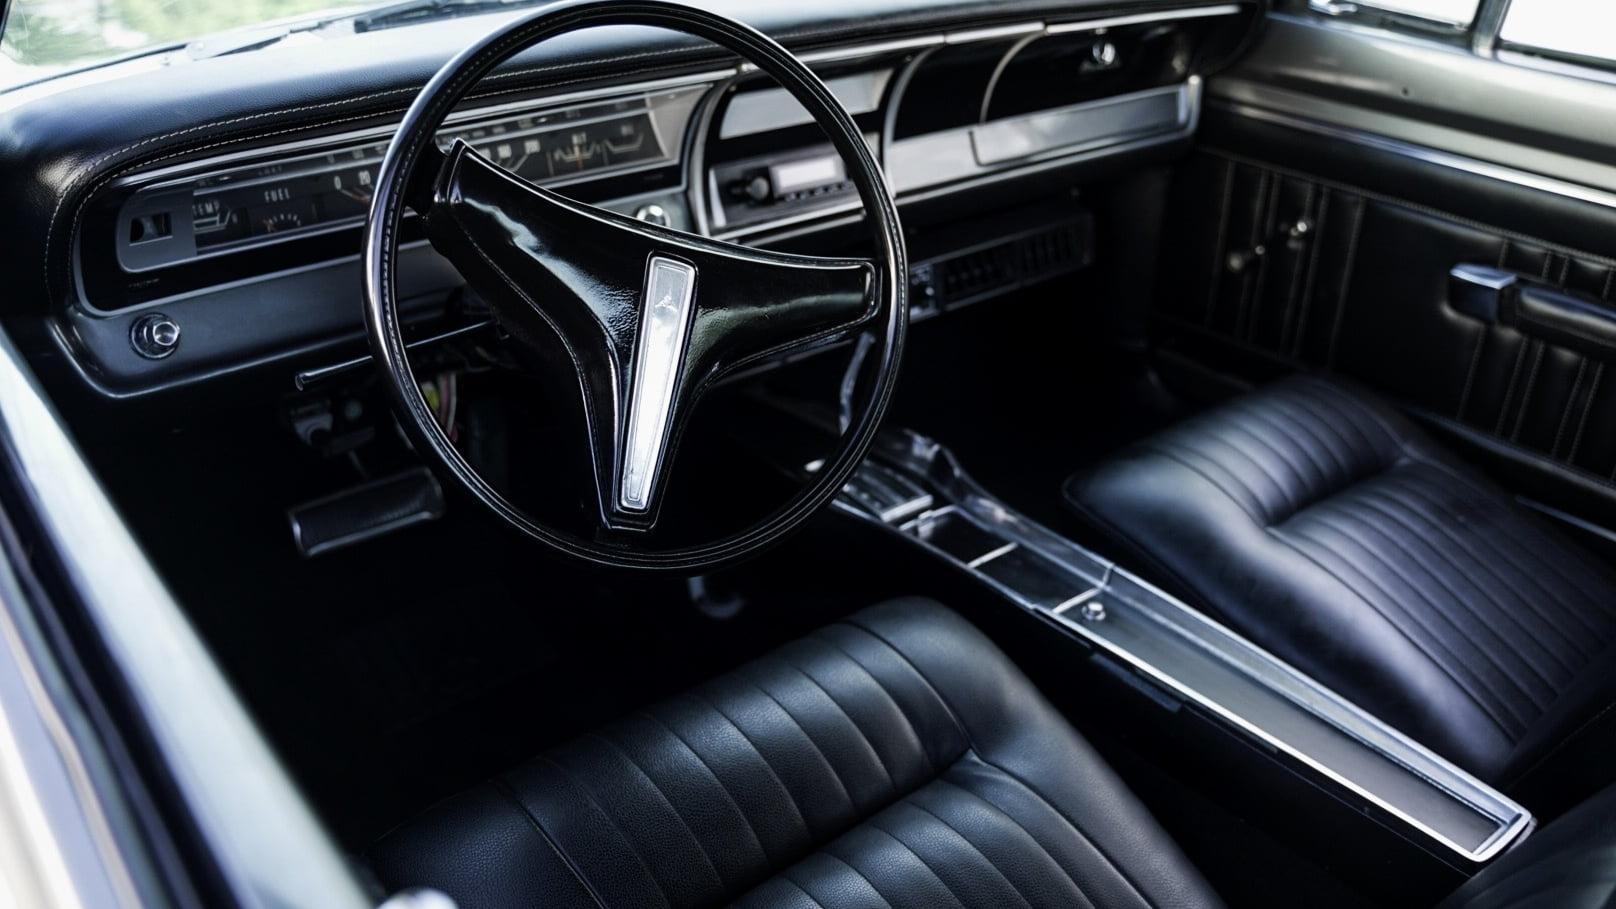 1970 Dodge Dart Front Interior